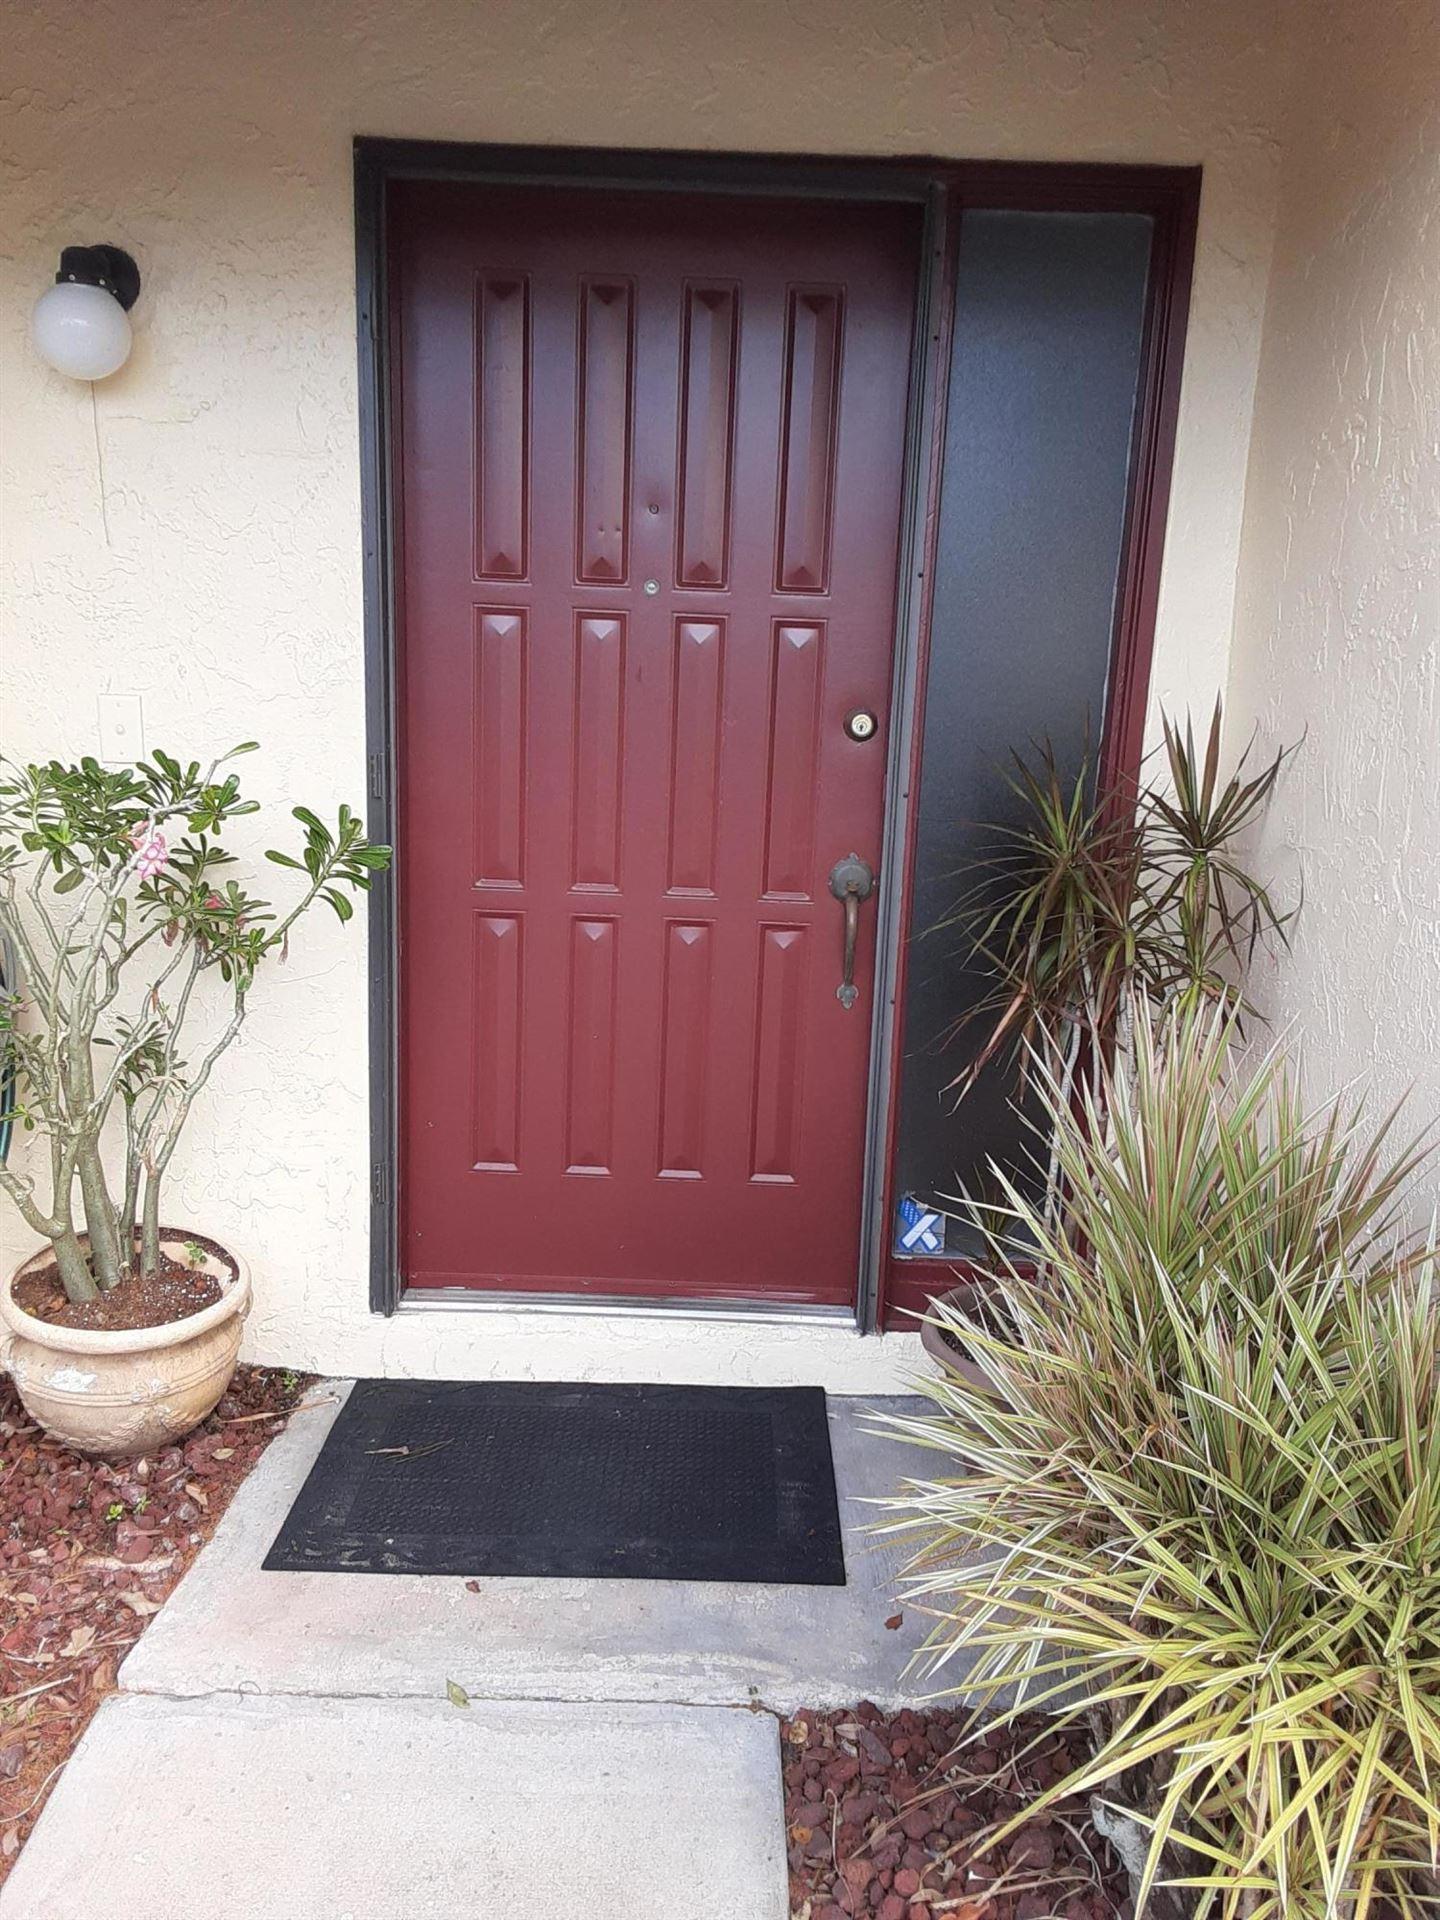 74 Macadamia Court, Royal Palm Beach, FL 33411 - #: RX-10603759